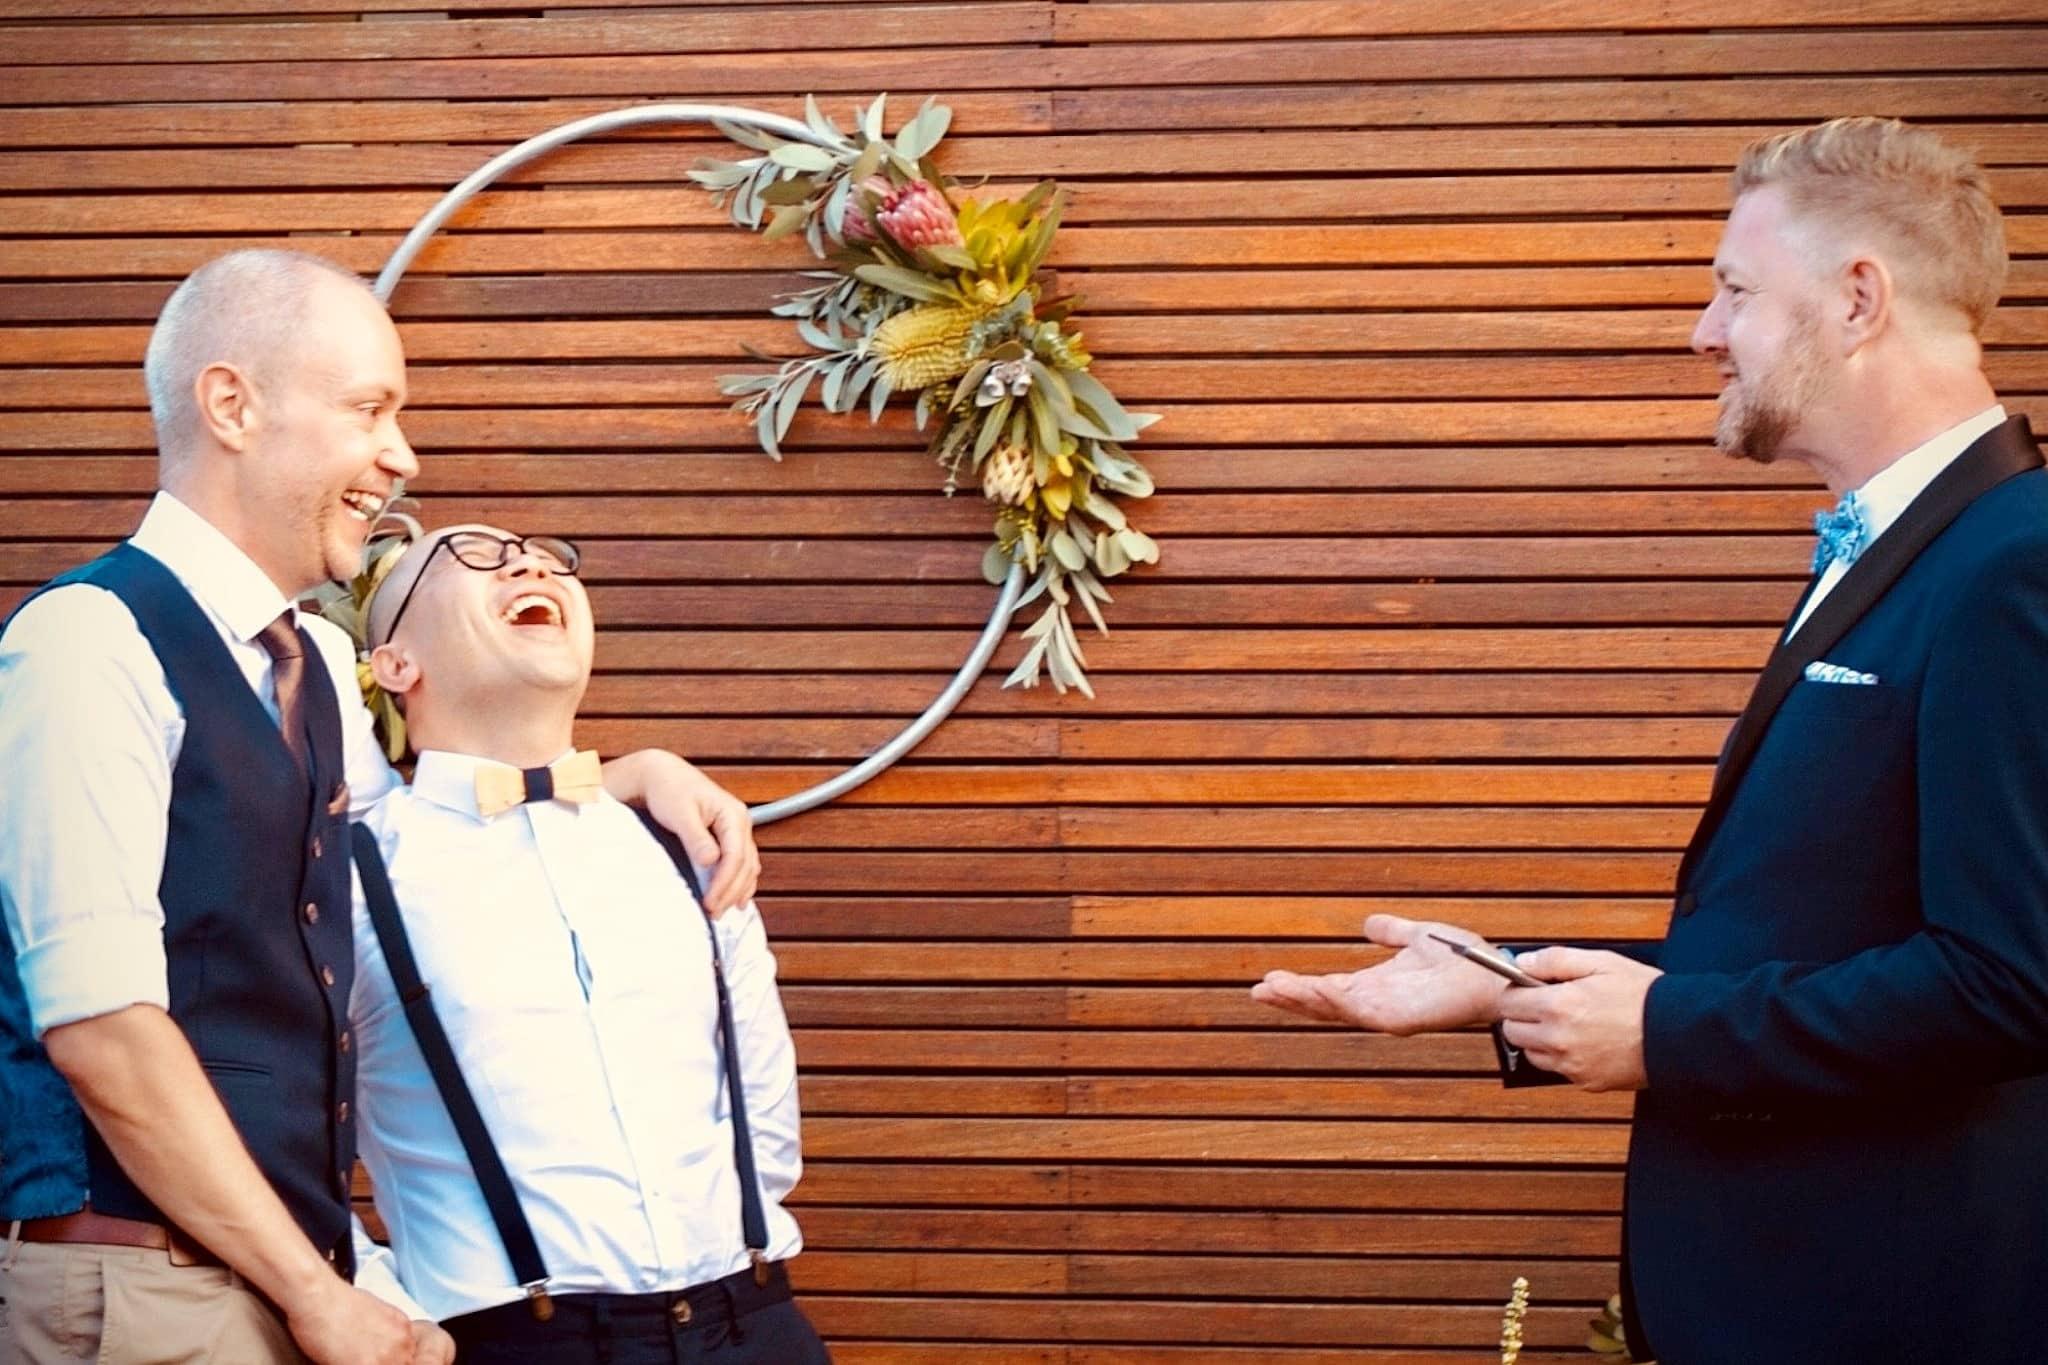 Darren and Johnsen Wedding - Stephen Lee Marriage Celebrant Sydney